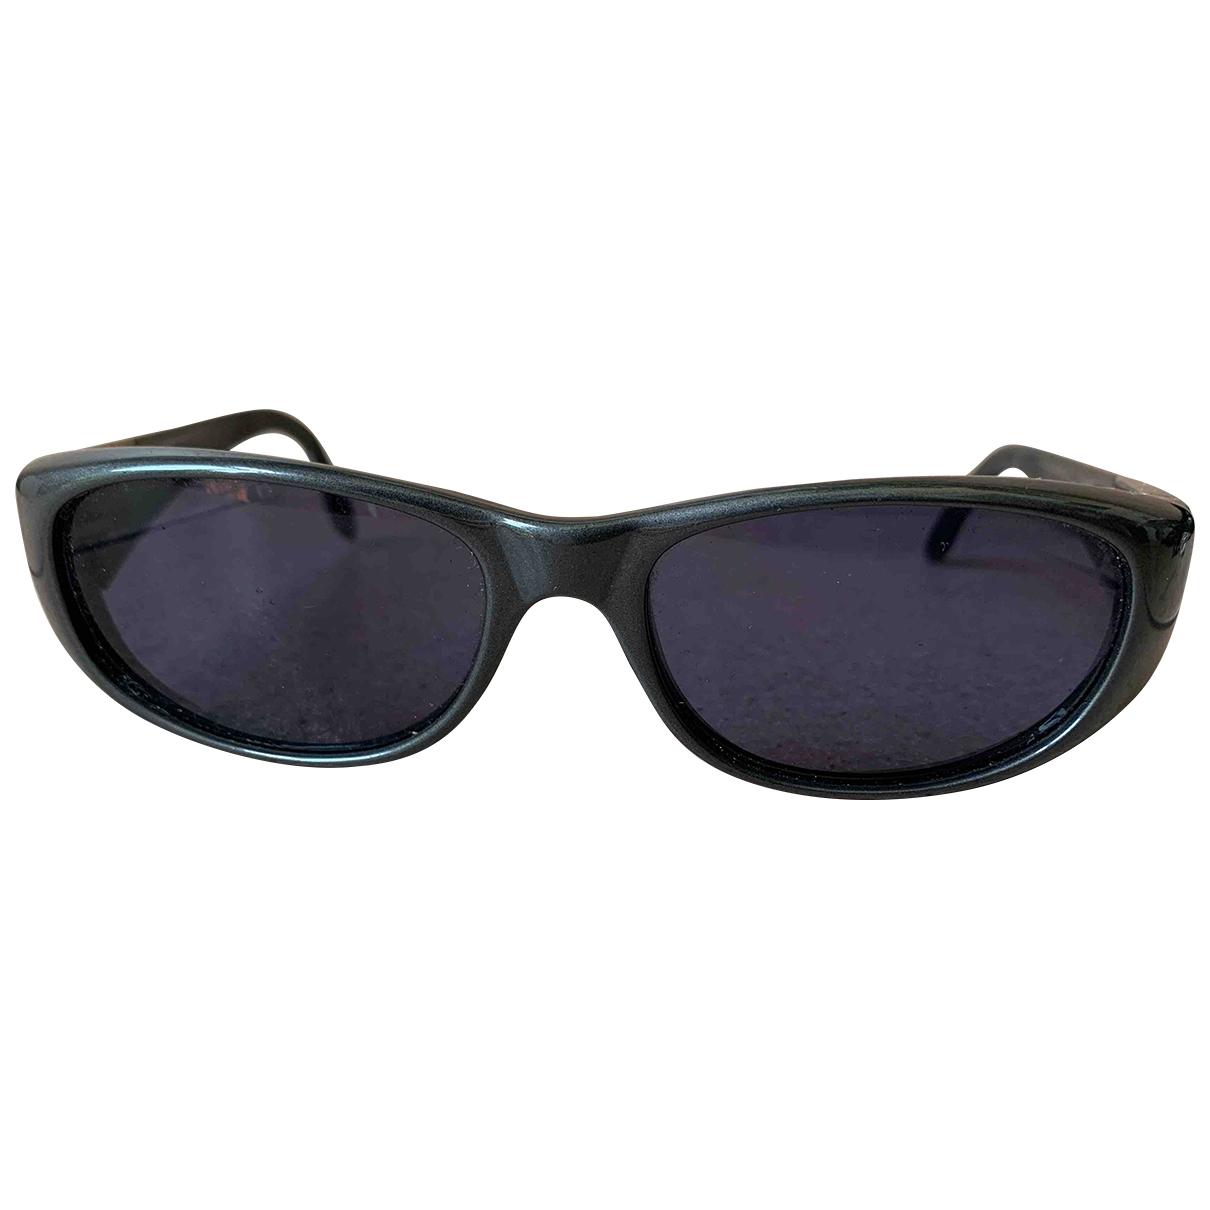 Dolce & Gabbana \N Green Sunglasses for Women \N